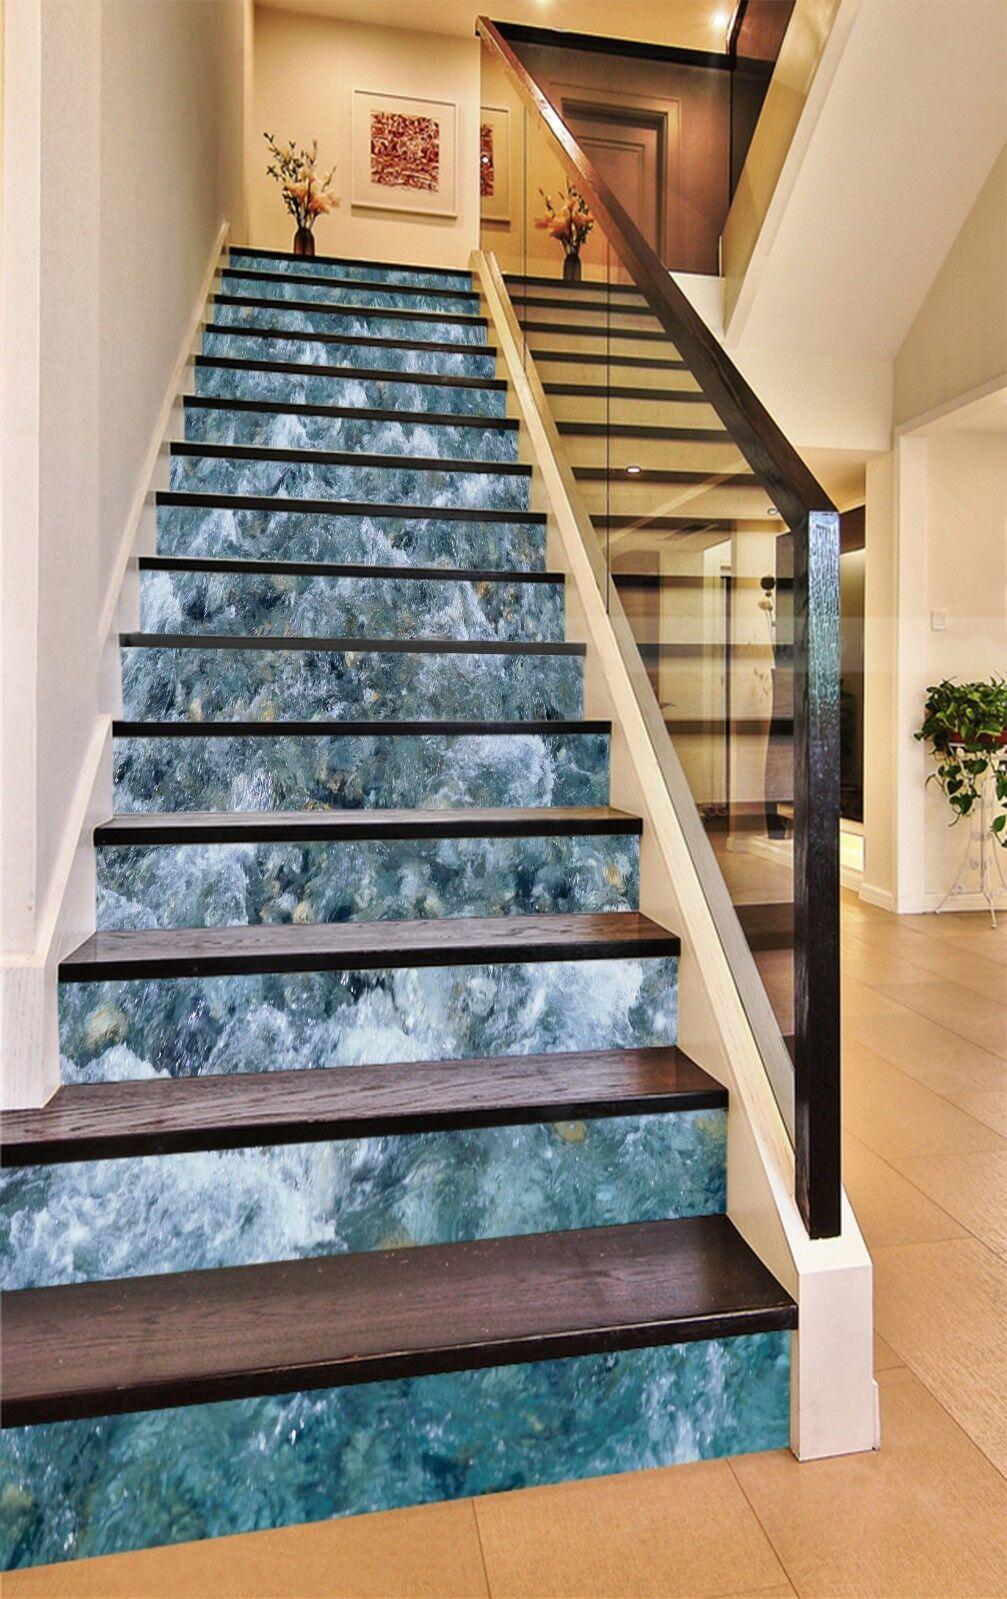 3D Blau water 7 Stair Risers Decoration Photo Mural Vinyl Decal WandPapier UK